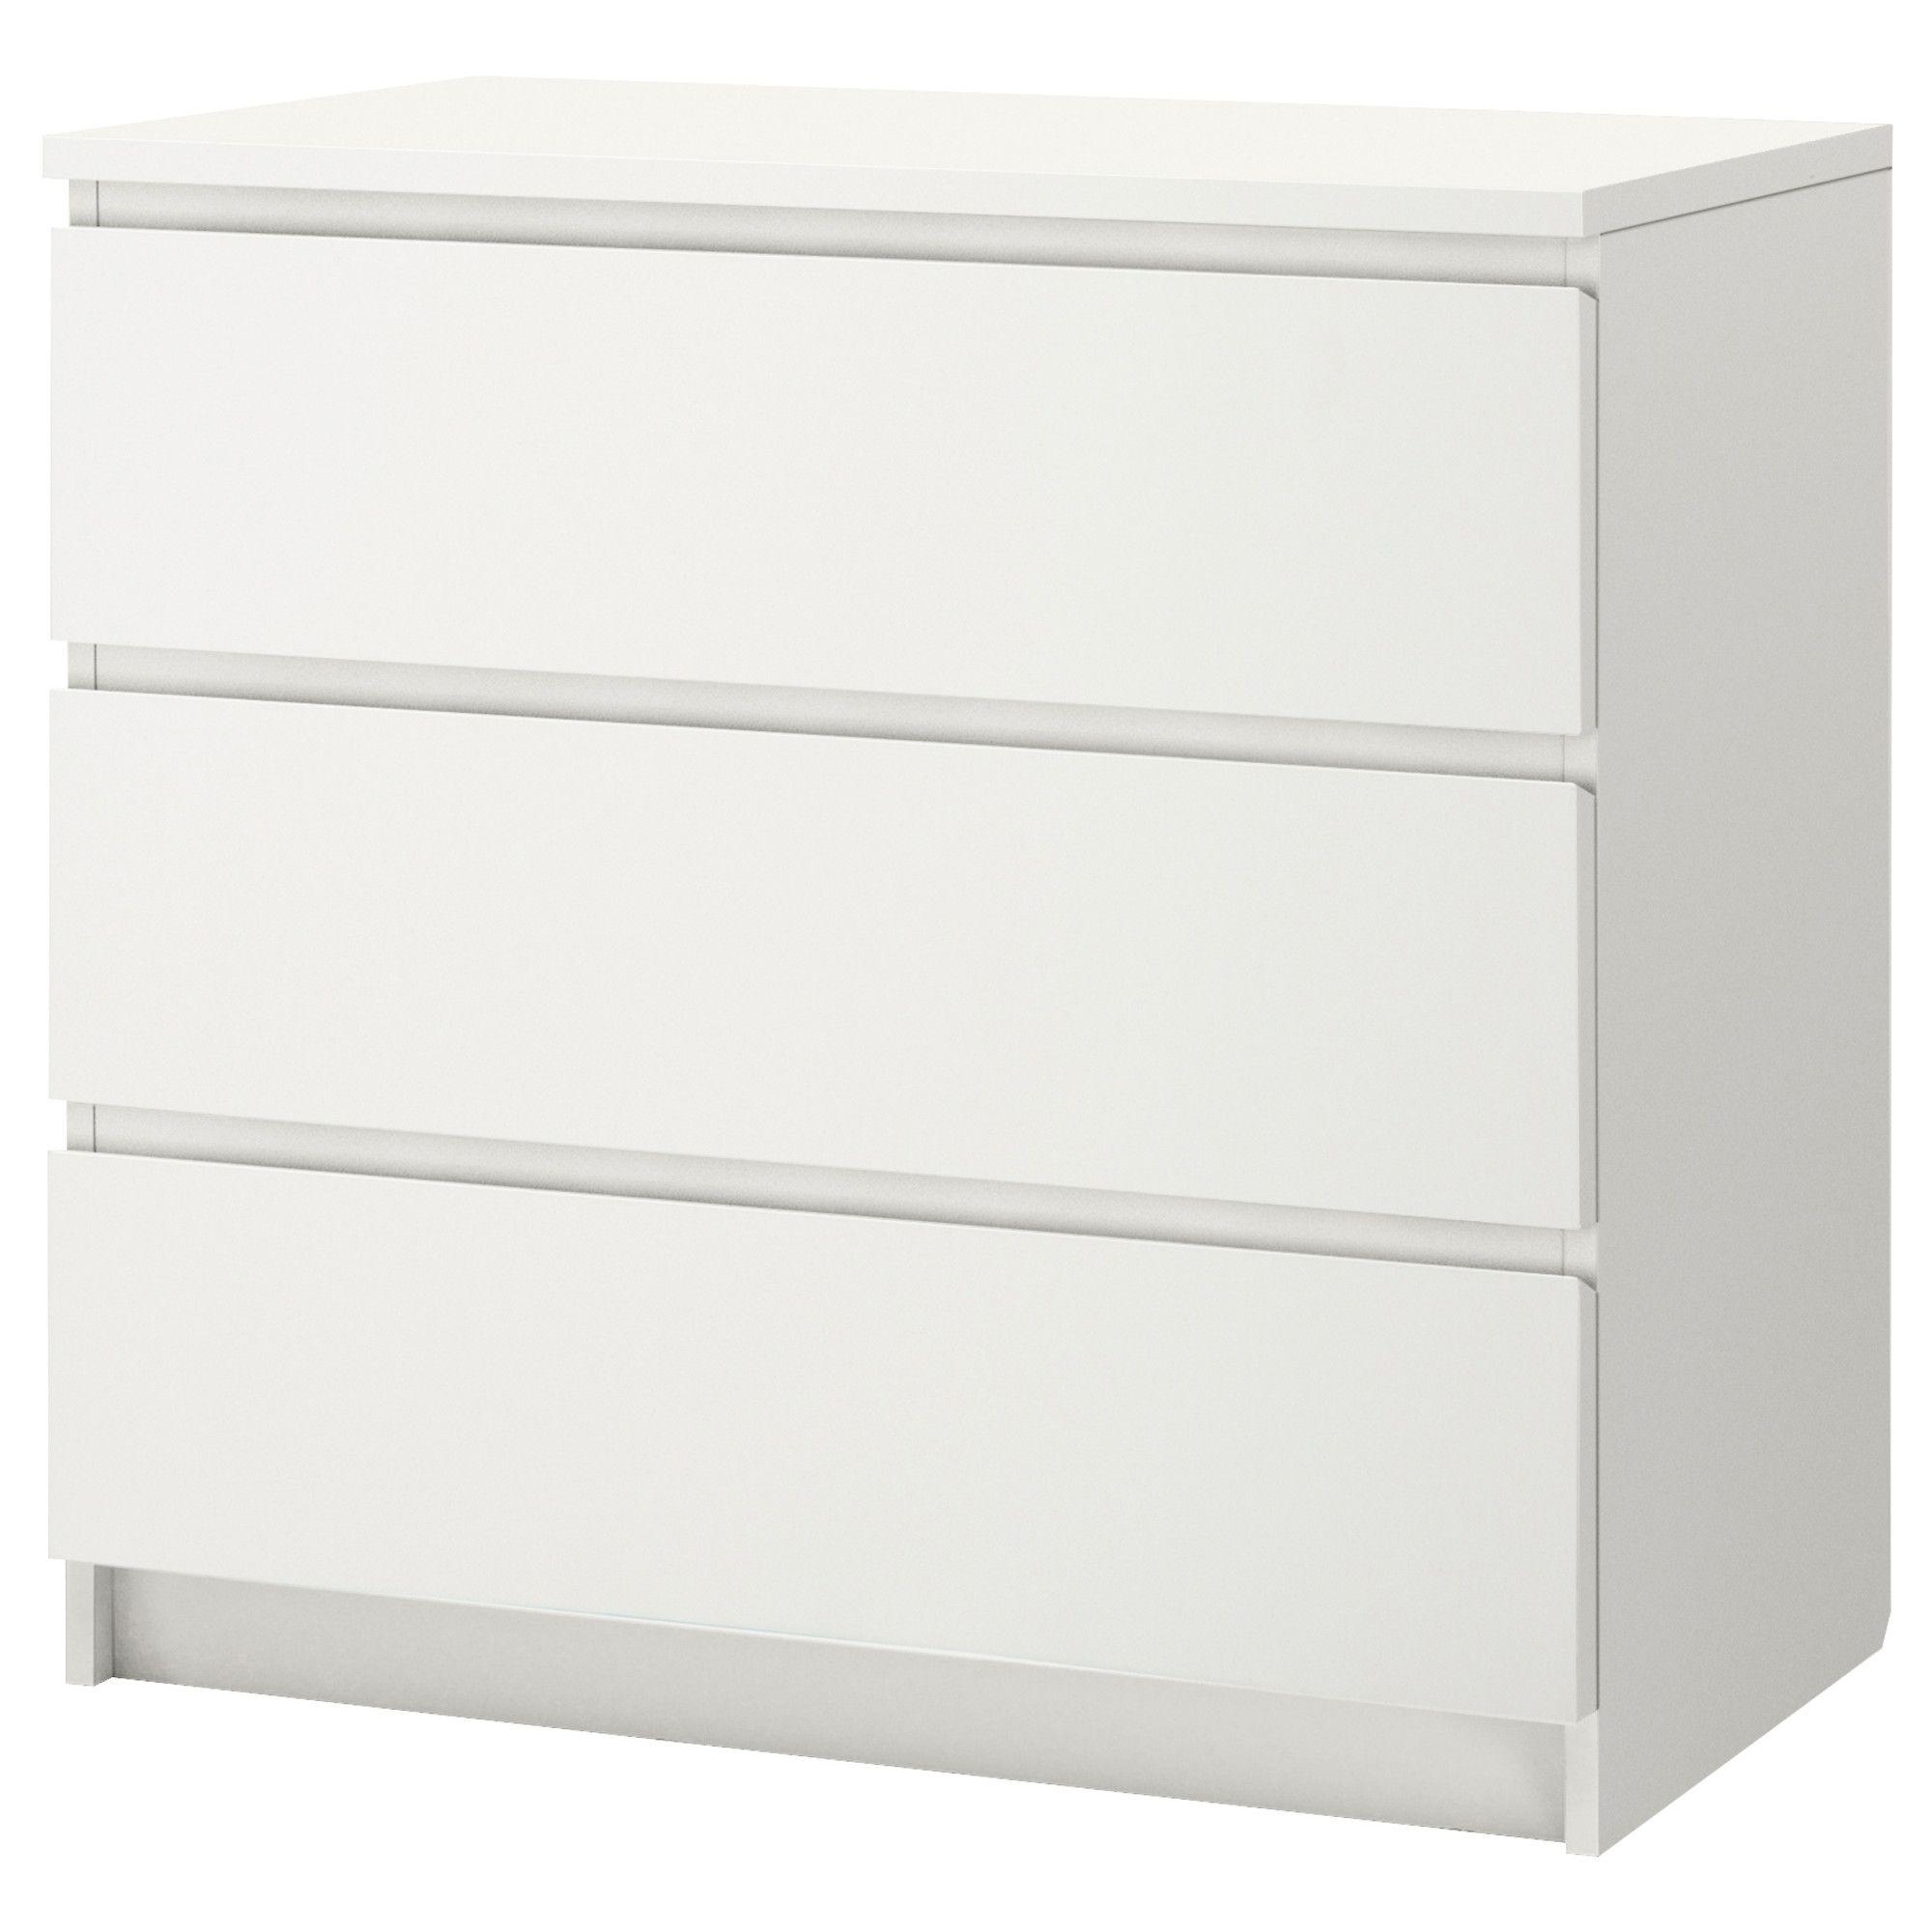 MALM Kommode mit 3 Schubladen, wei | Ikea | Pinterest ...